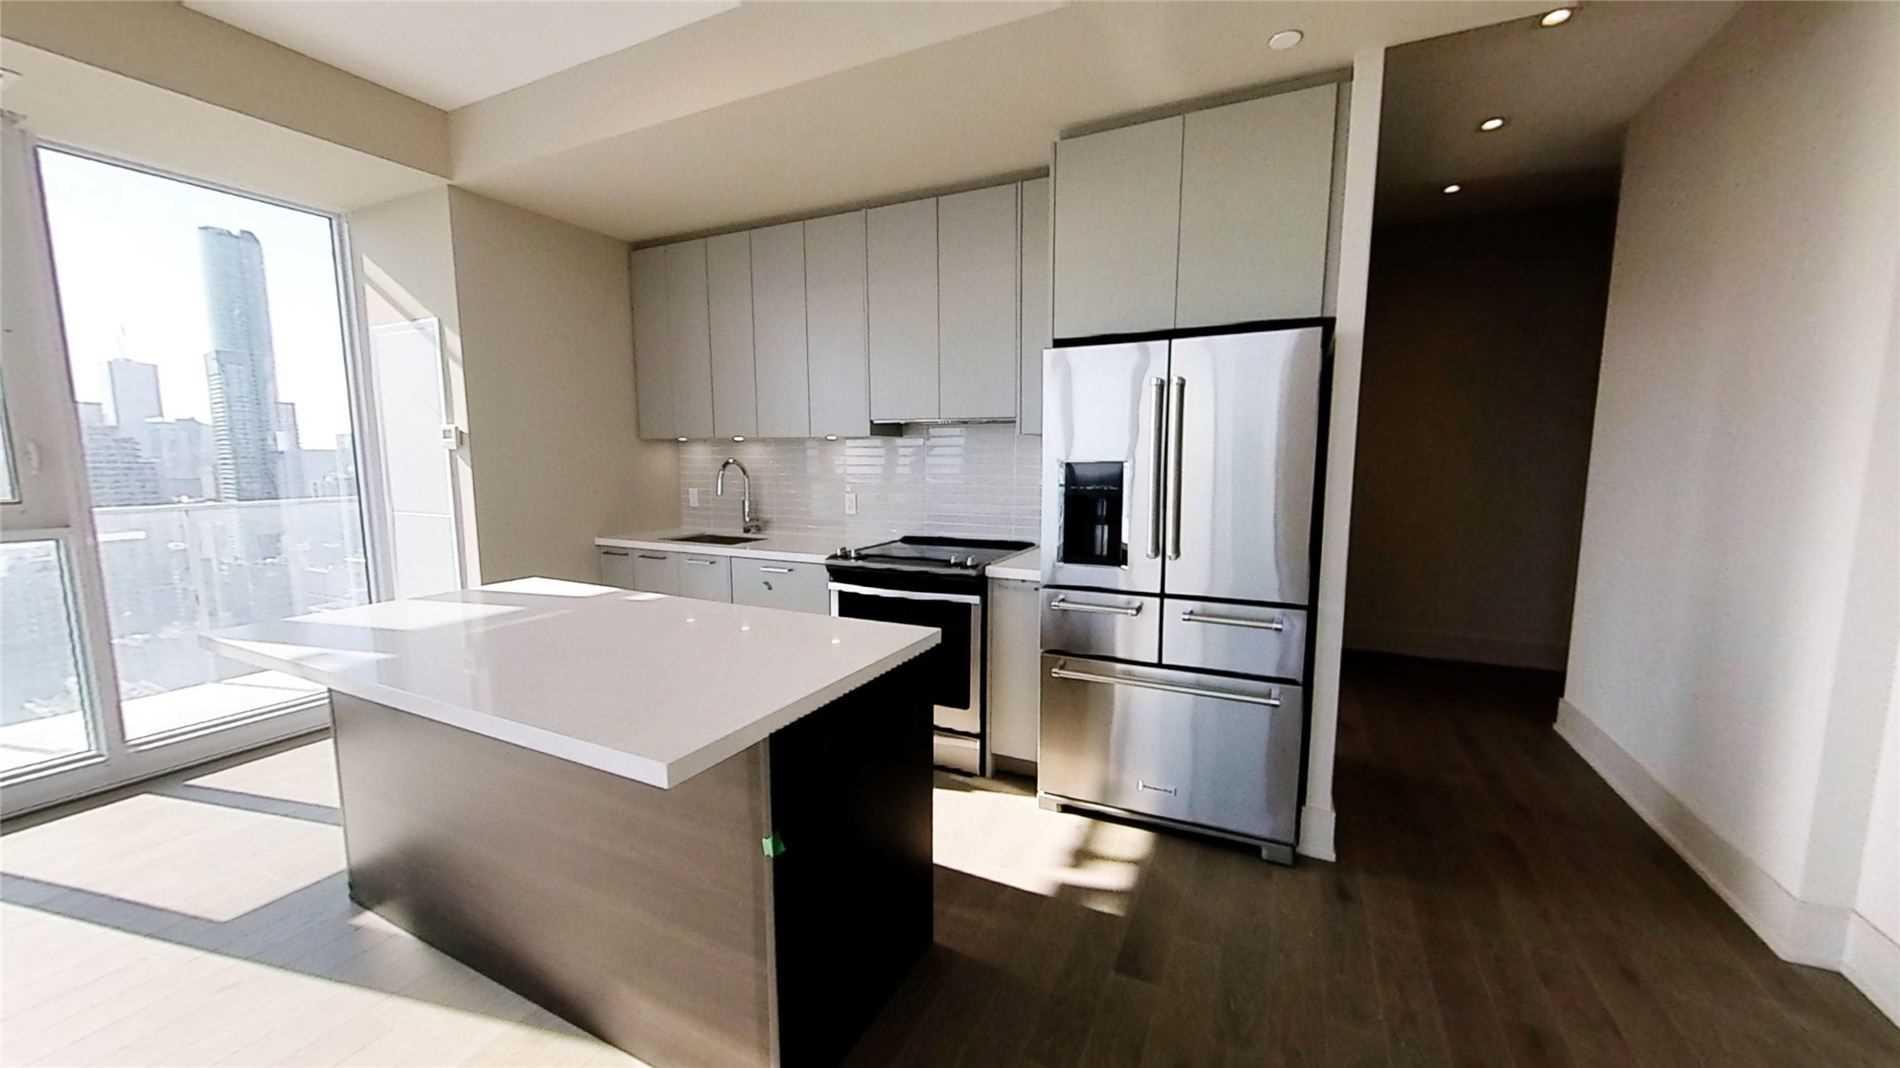 50 Wellesley St, Toronto, Ontario M4Y1G2, 2 Bedrooms Bedrooms, 5 Rooms Rooms,2 BathroomsBathrooms,Condo Apt,For Sale,Wellesley,C5030638